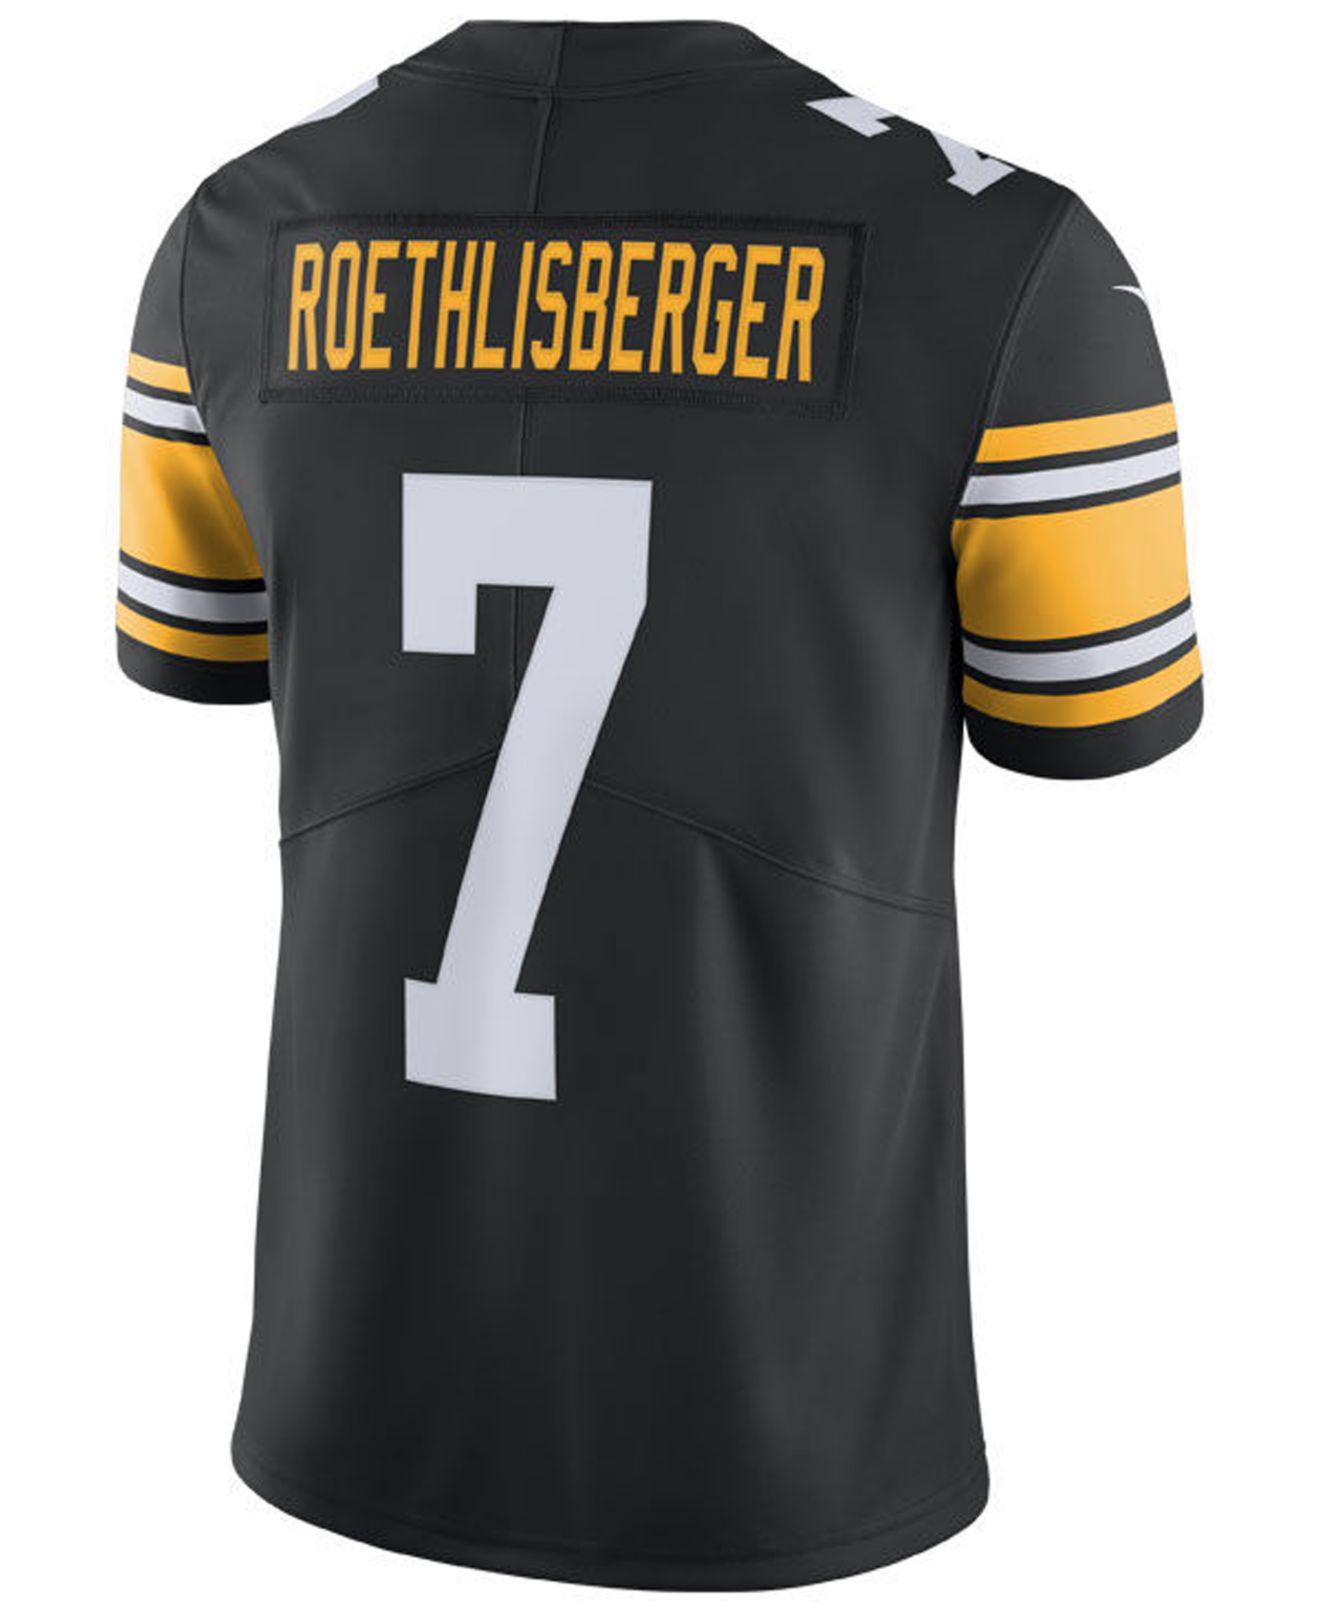 6681ef529 Lyst - Nike Ben Roethlisberger Pittsburgh Steelers Vapor Untouchable  Limited Jersey in Black for Men